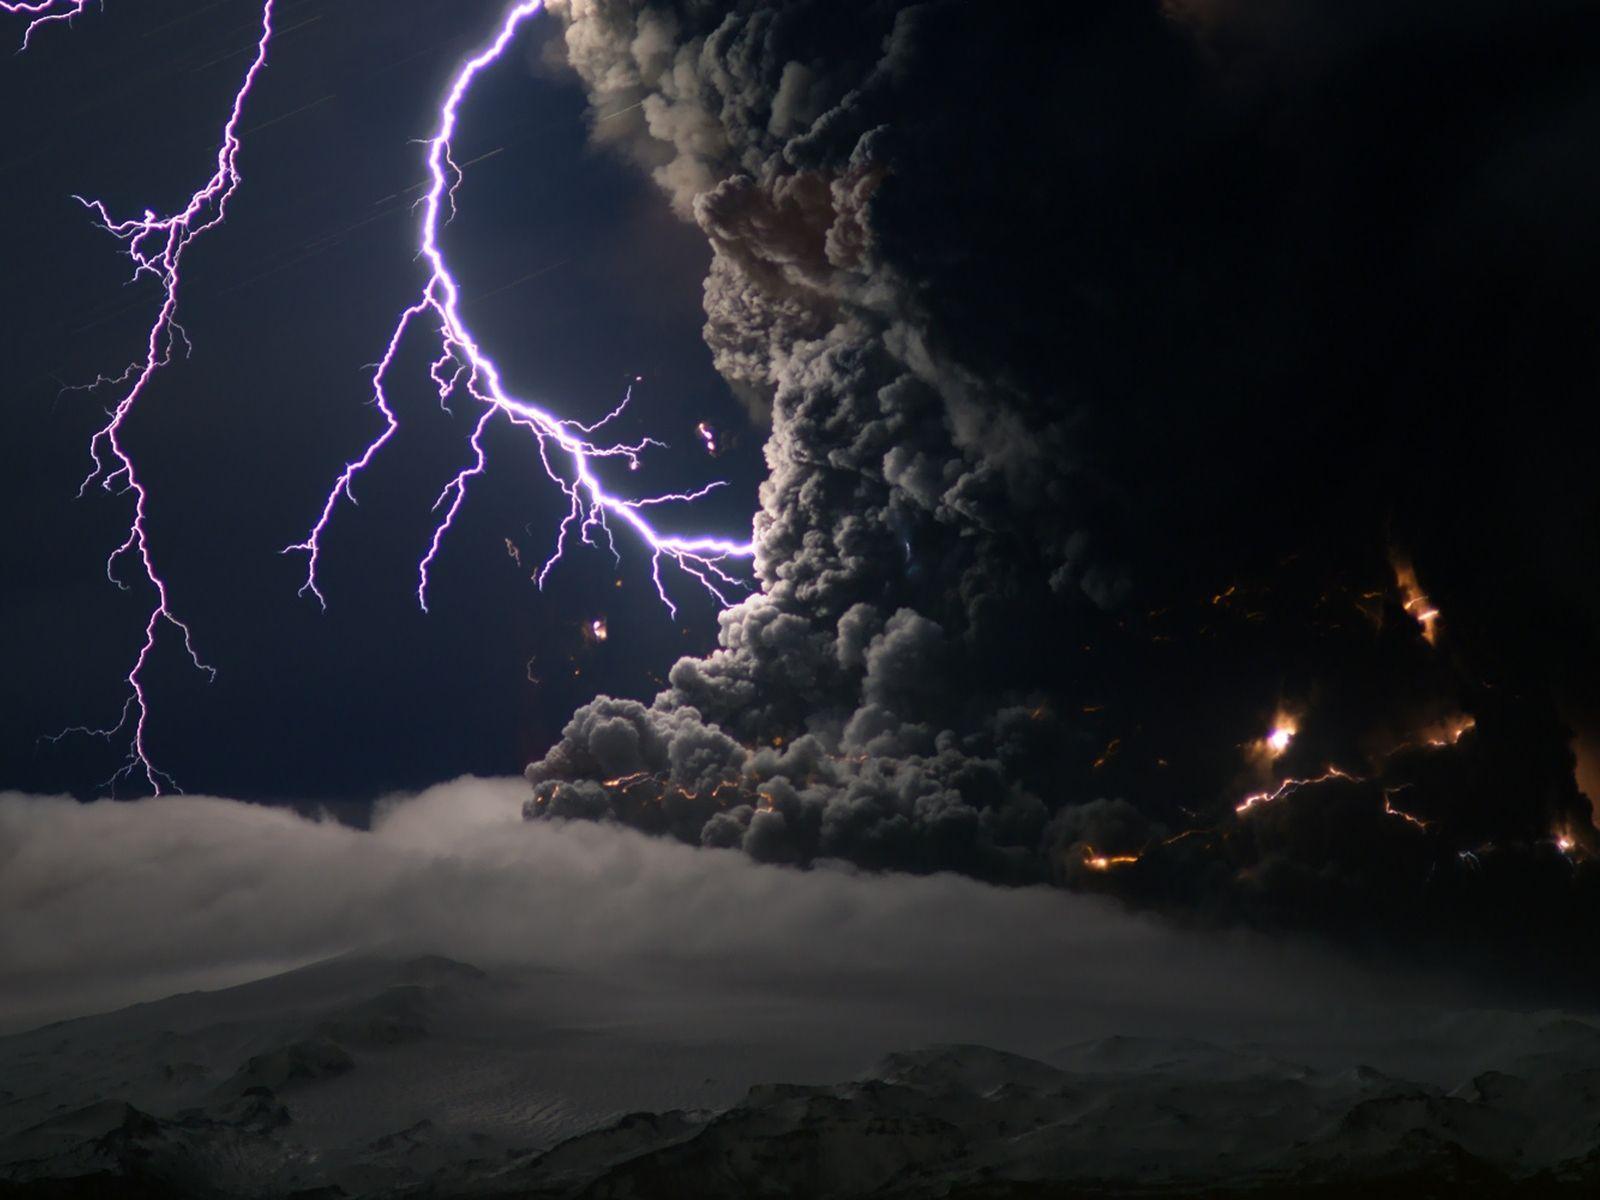 Amazing Storm Wallpaper